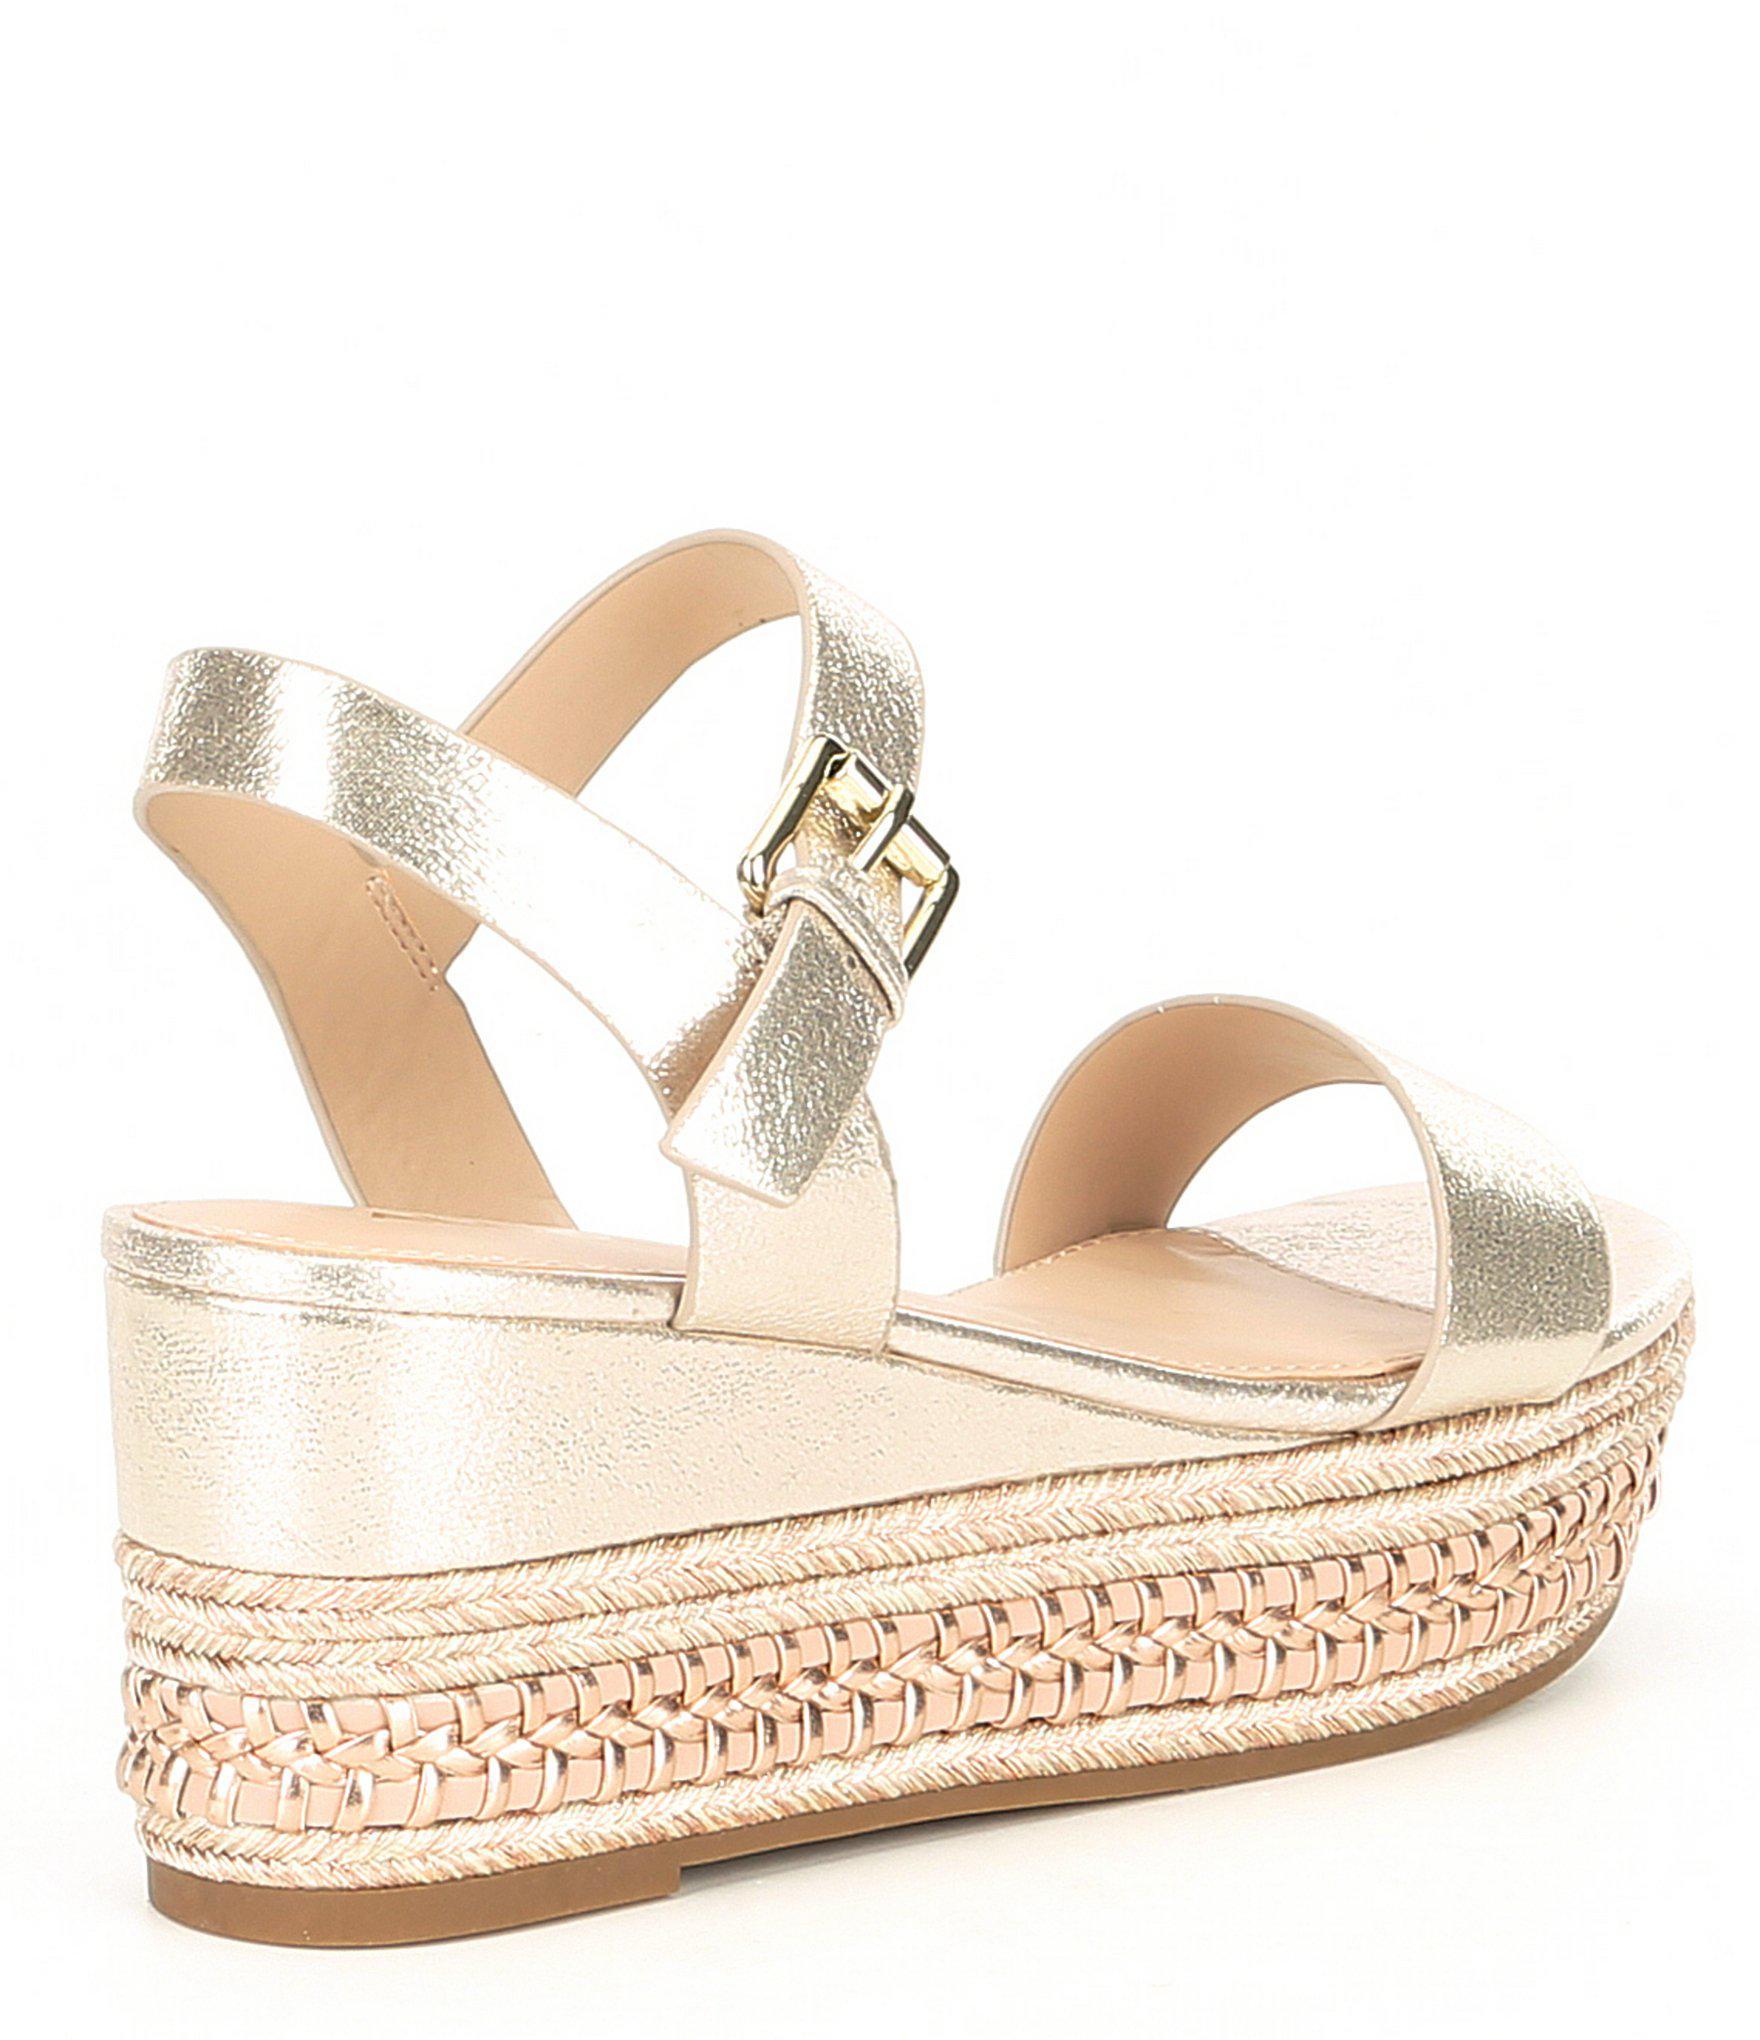 768250eaf5d1 ALDO - Metallic Mauma Espadrille Sandals - Lyst. View fullscreen